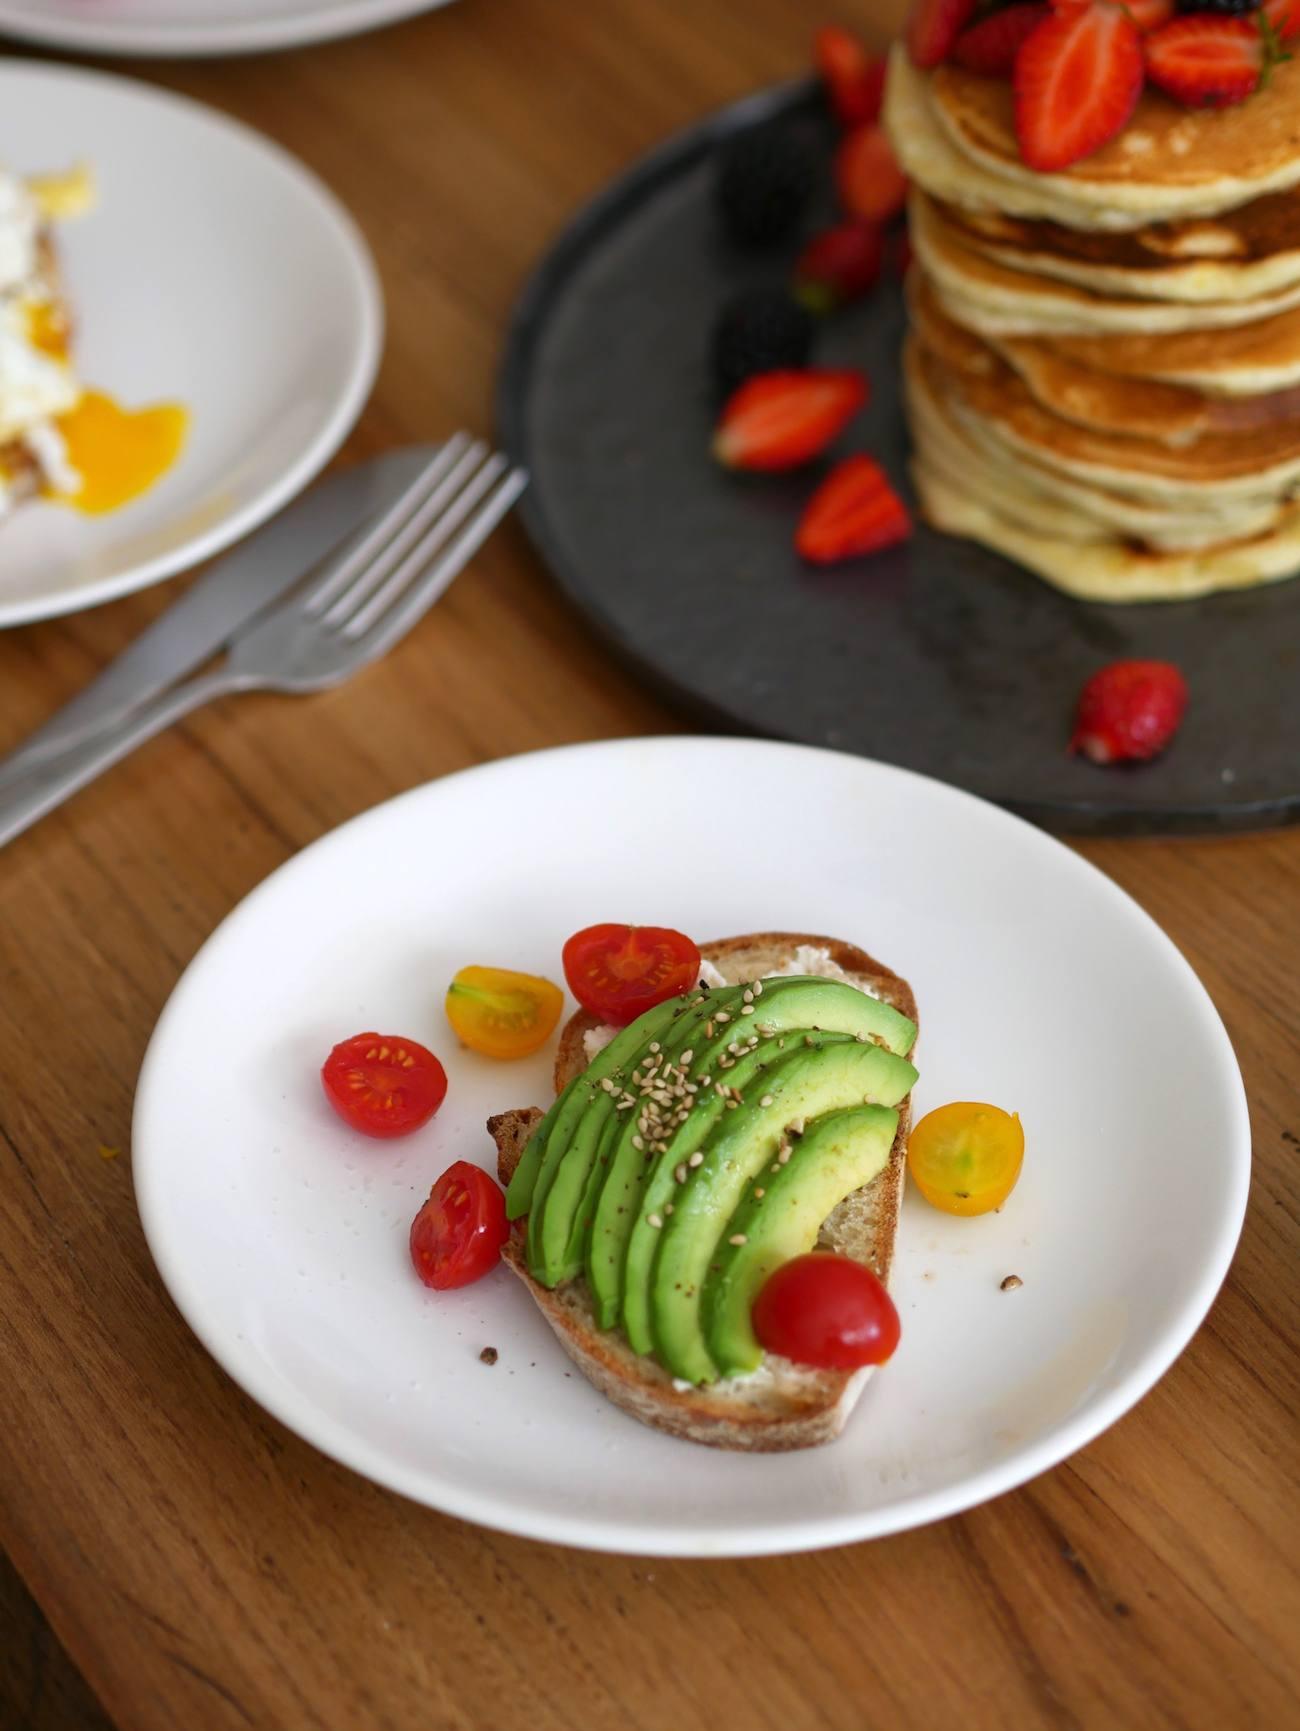 brunch-maison-recette-pancakes-toast-oeuf-benedicte-infuz-9